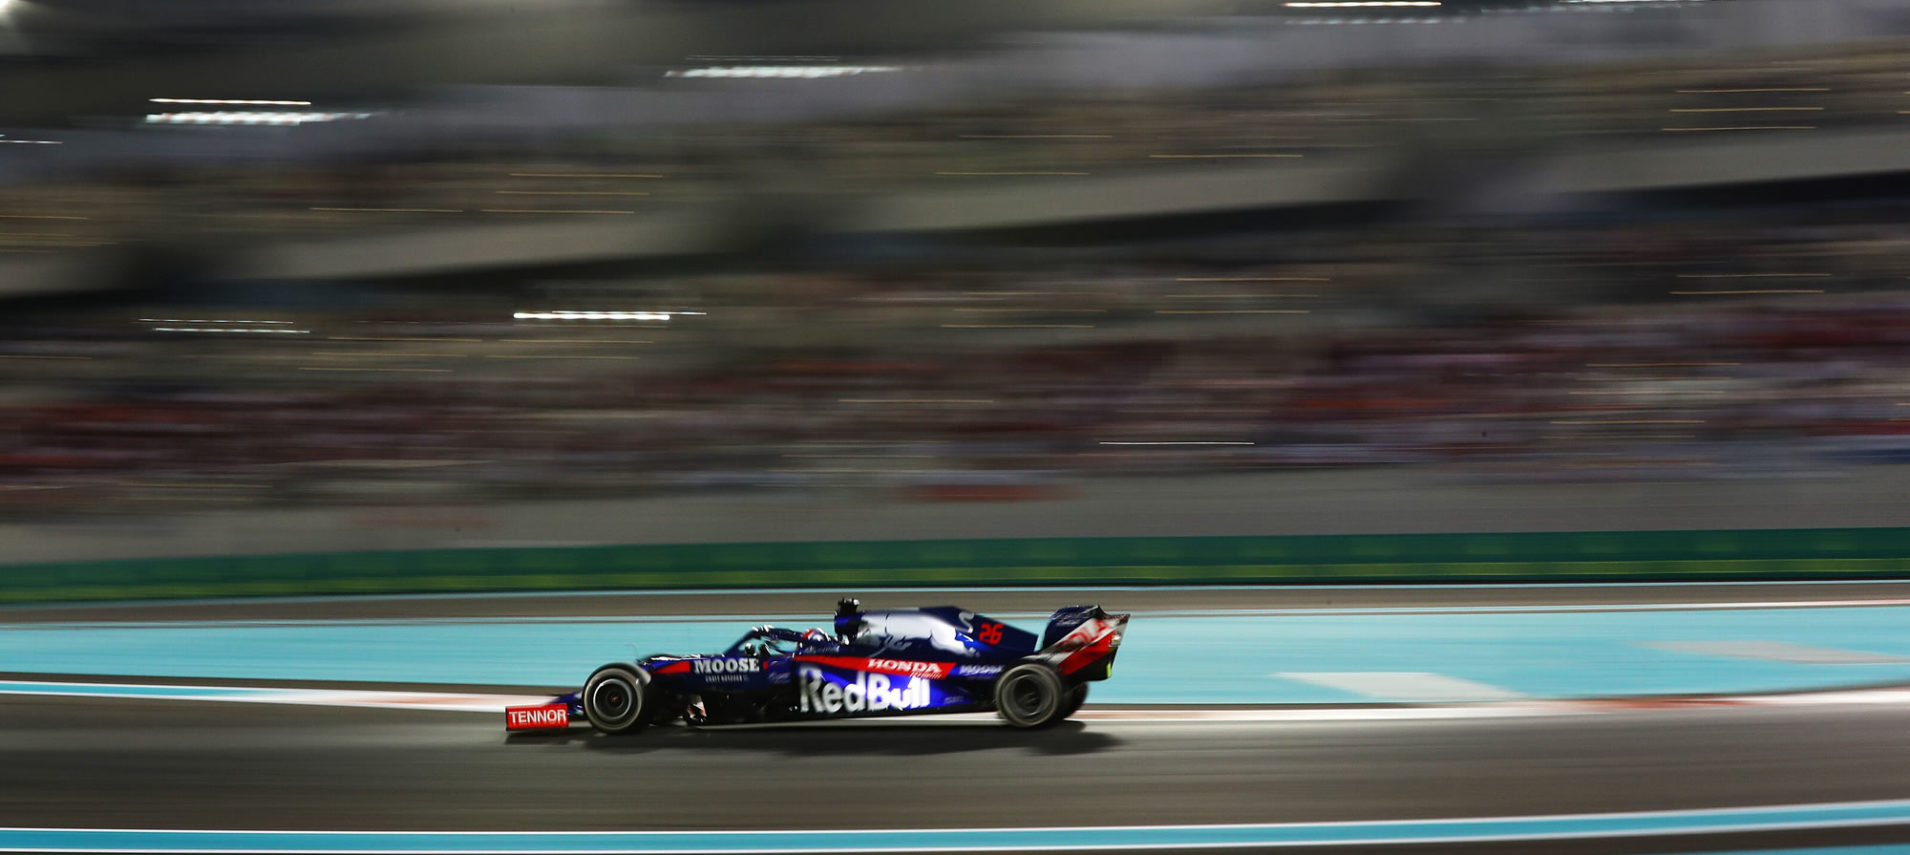 2019 Abu Dhabi GP – Gallery 2